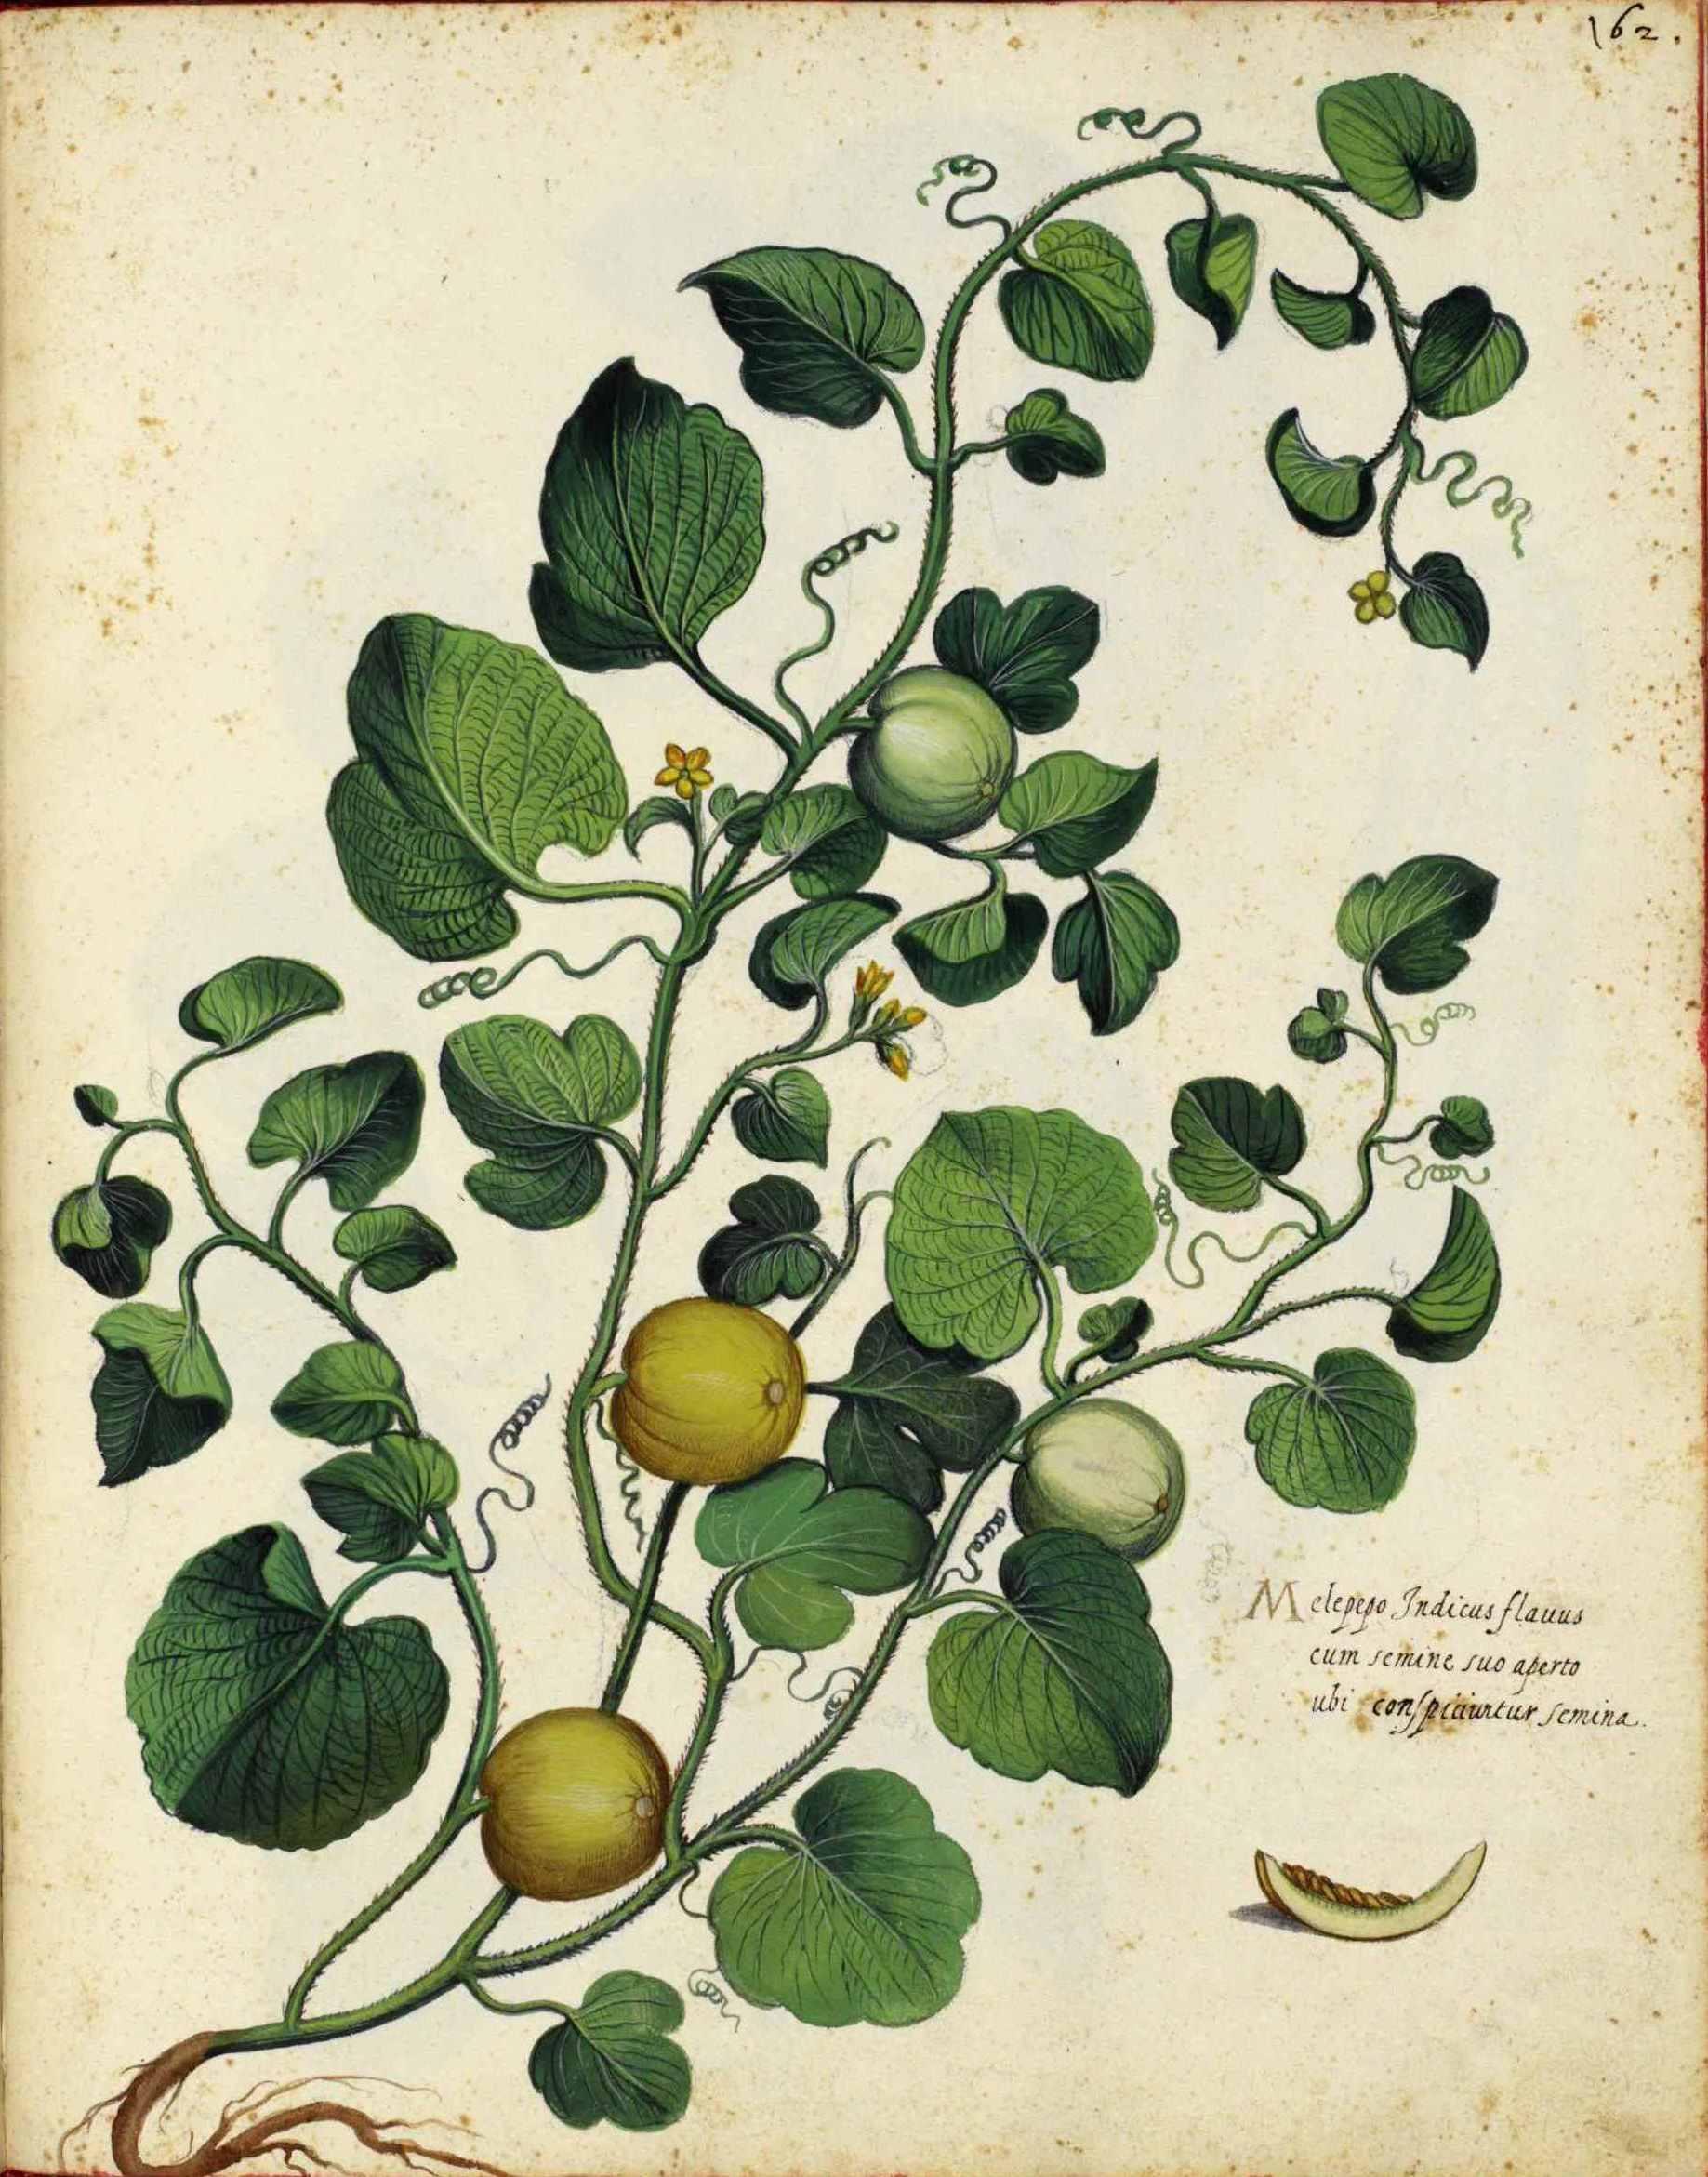 Cantaloupe seeds Facts and Health Benefits  Cantaloupe seed...